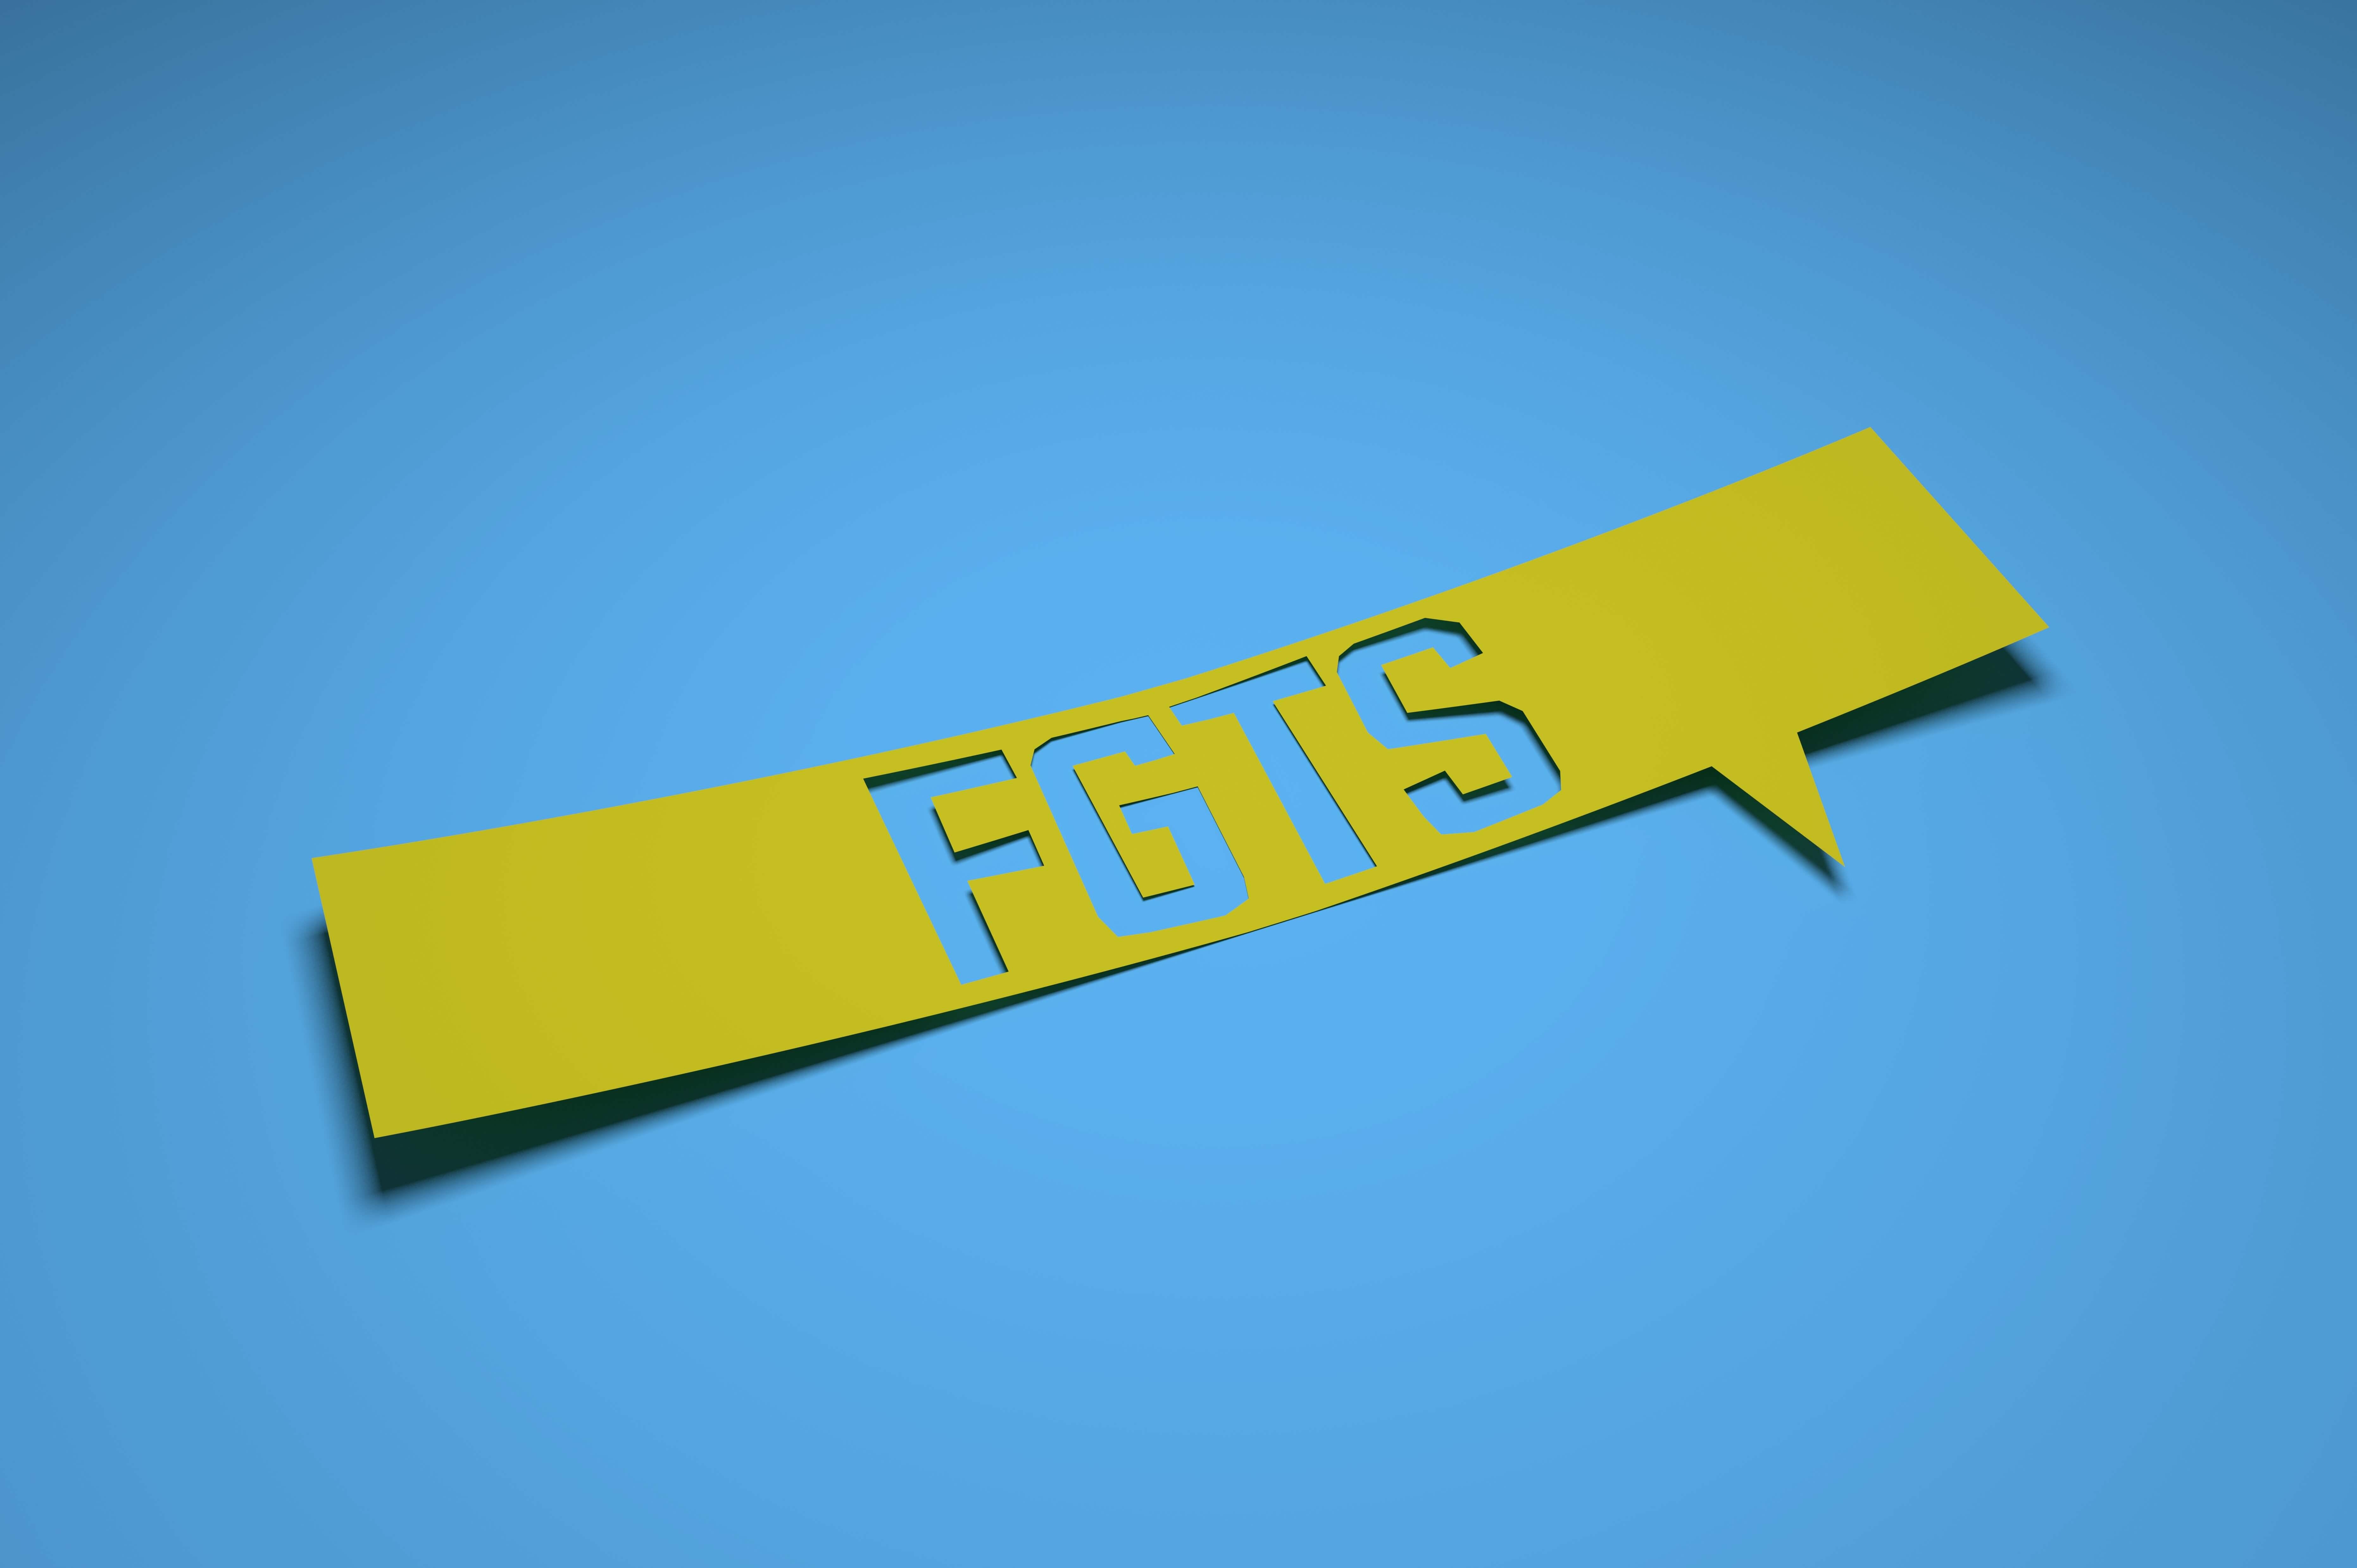 Como sacar FGTS para compra de imóvel?